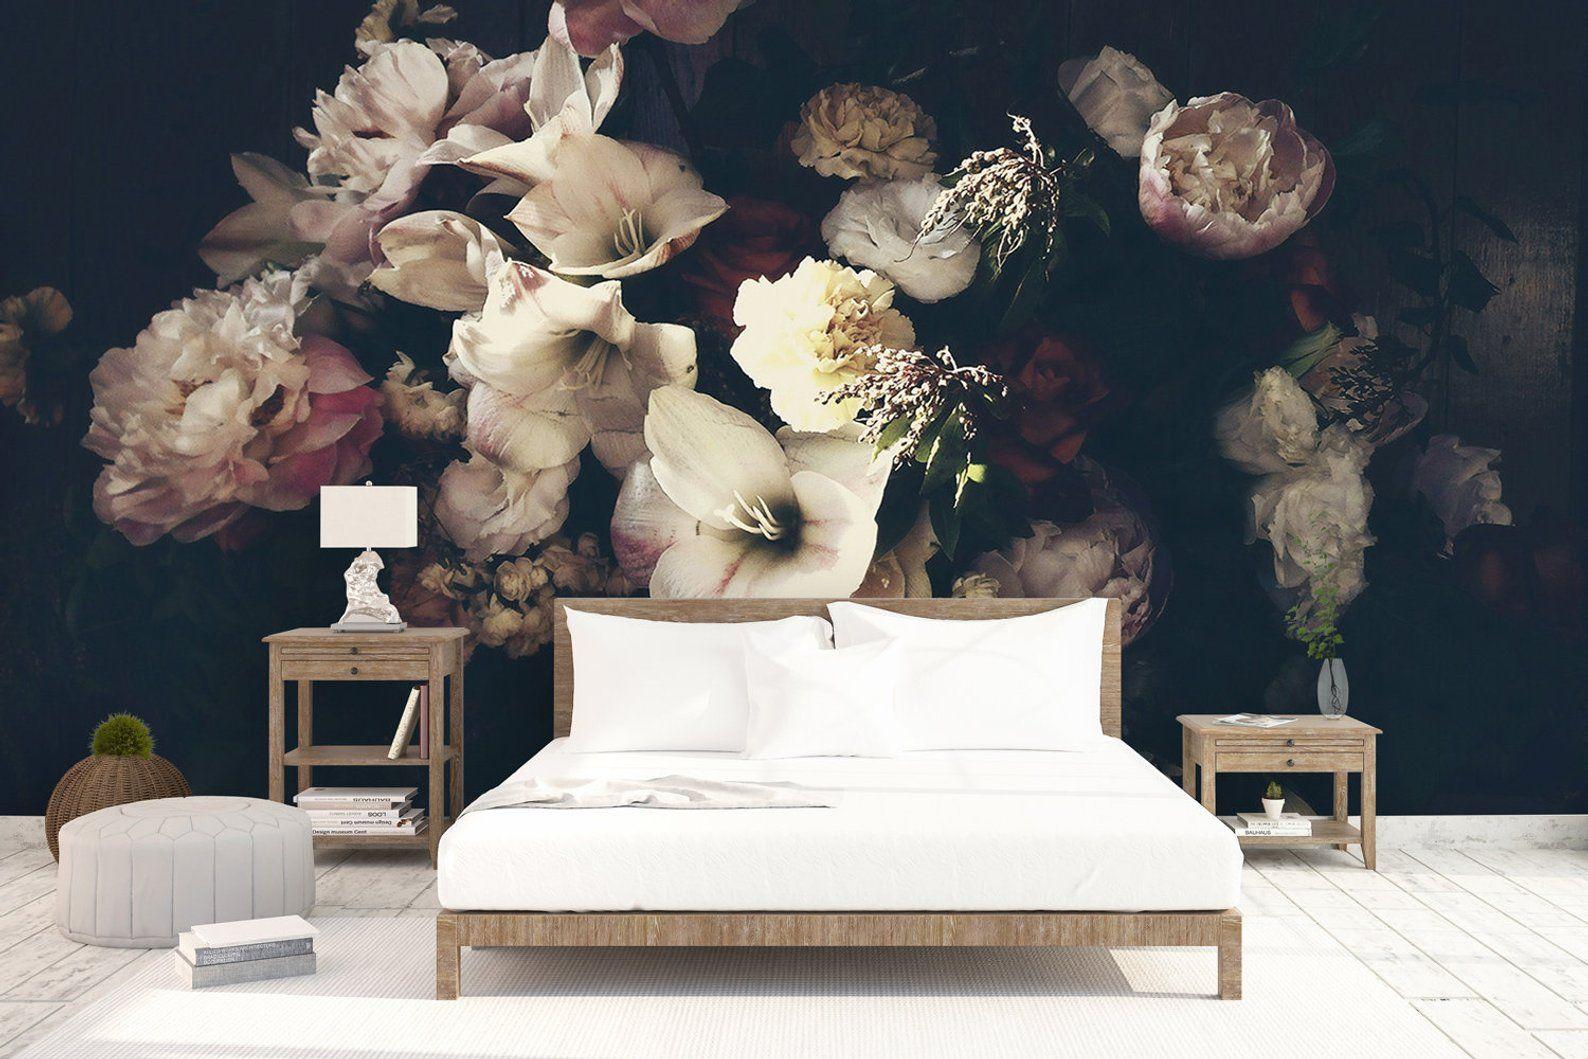 Colori Da Parete Per Camerette dark floral wallpaper dutch florals wall mural peony blossom